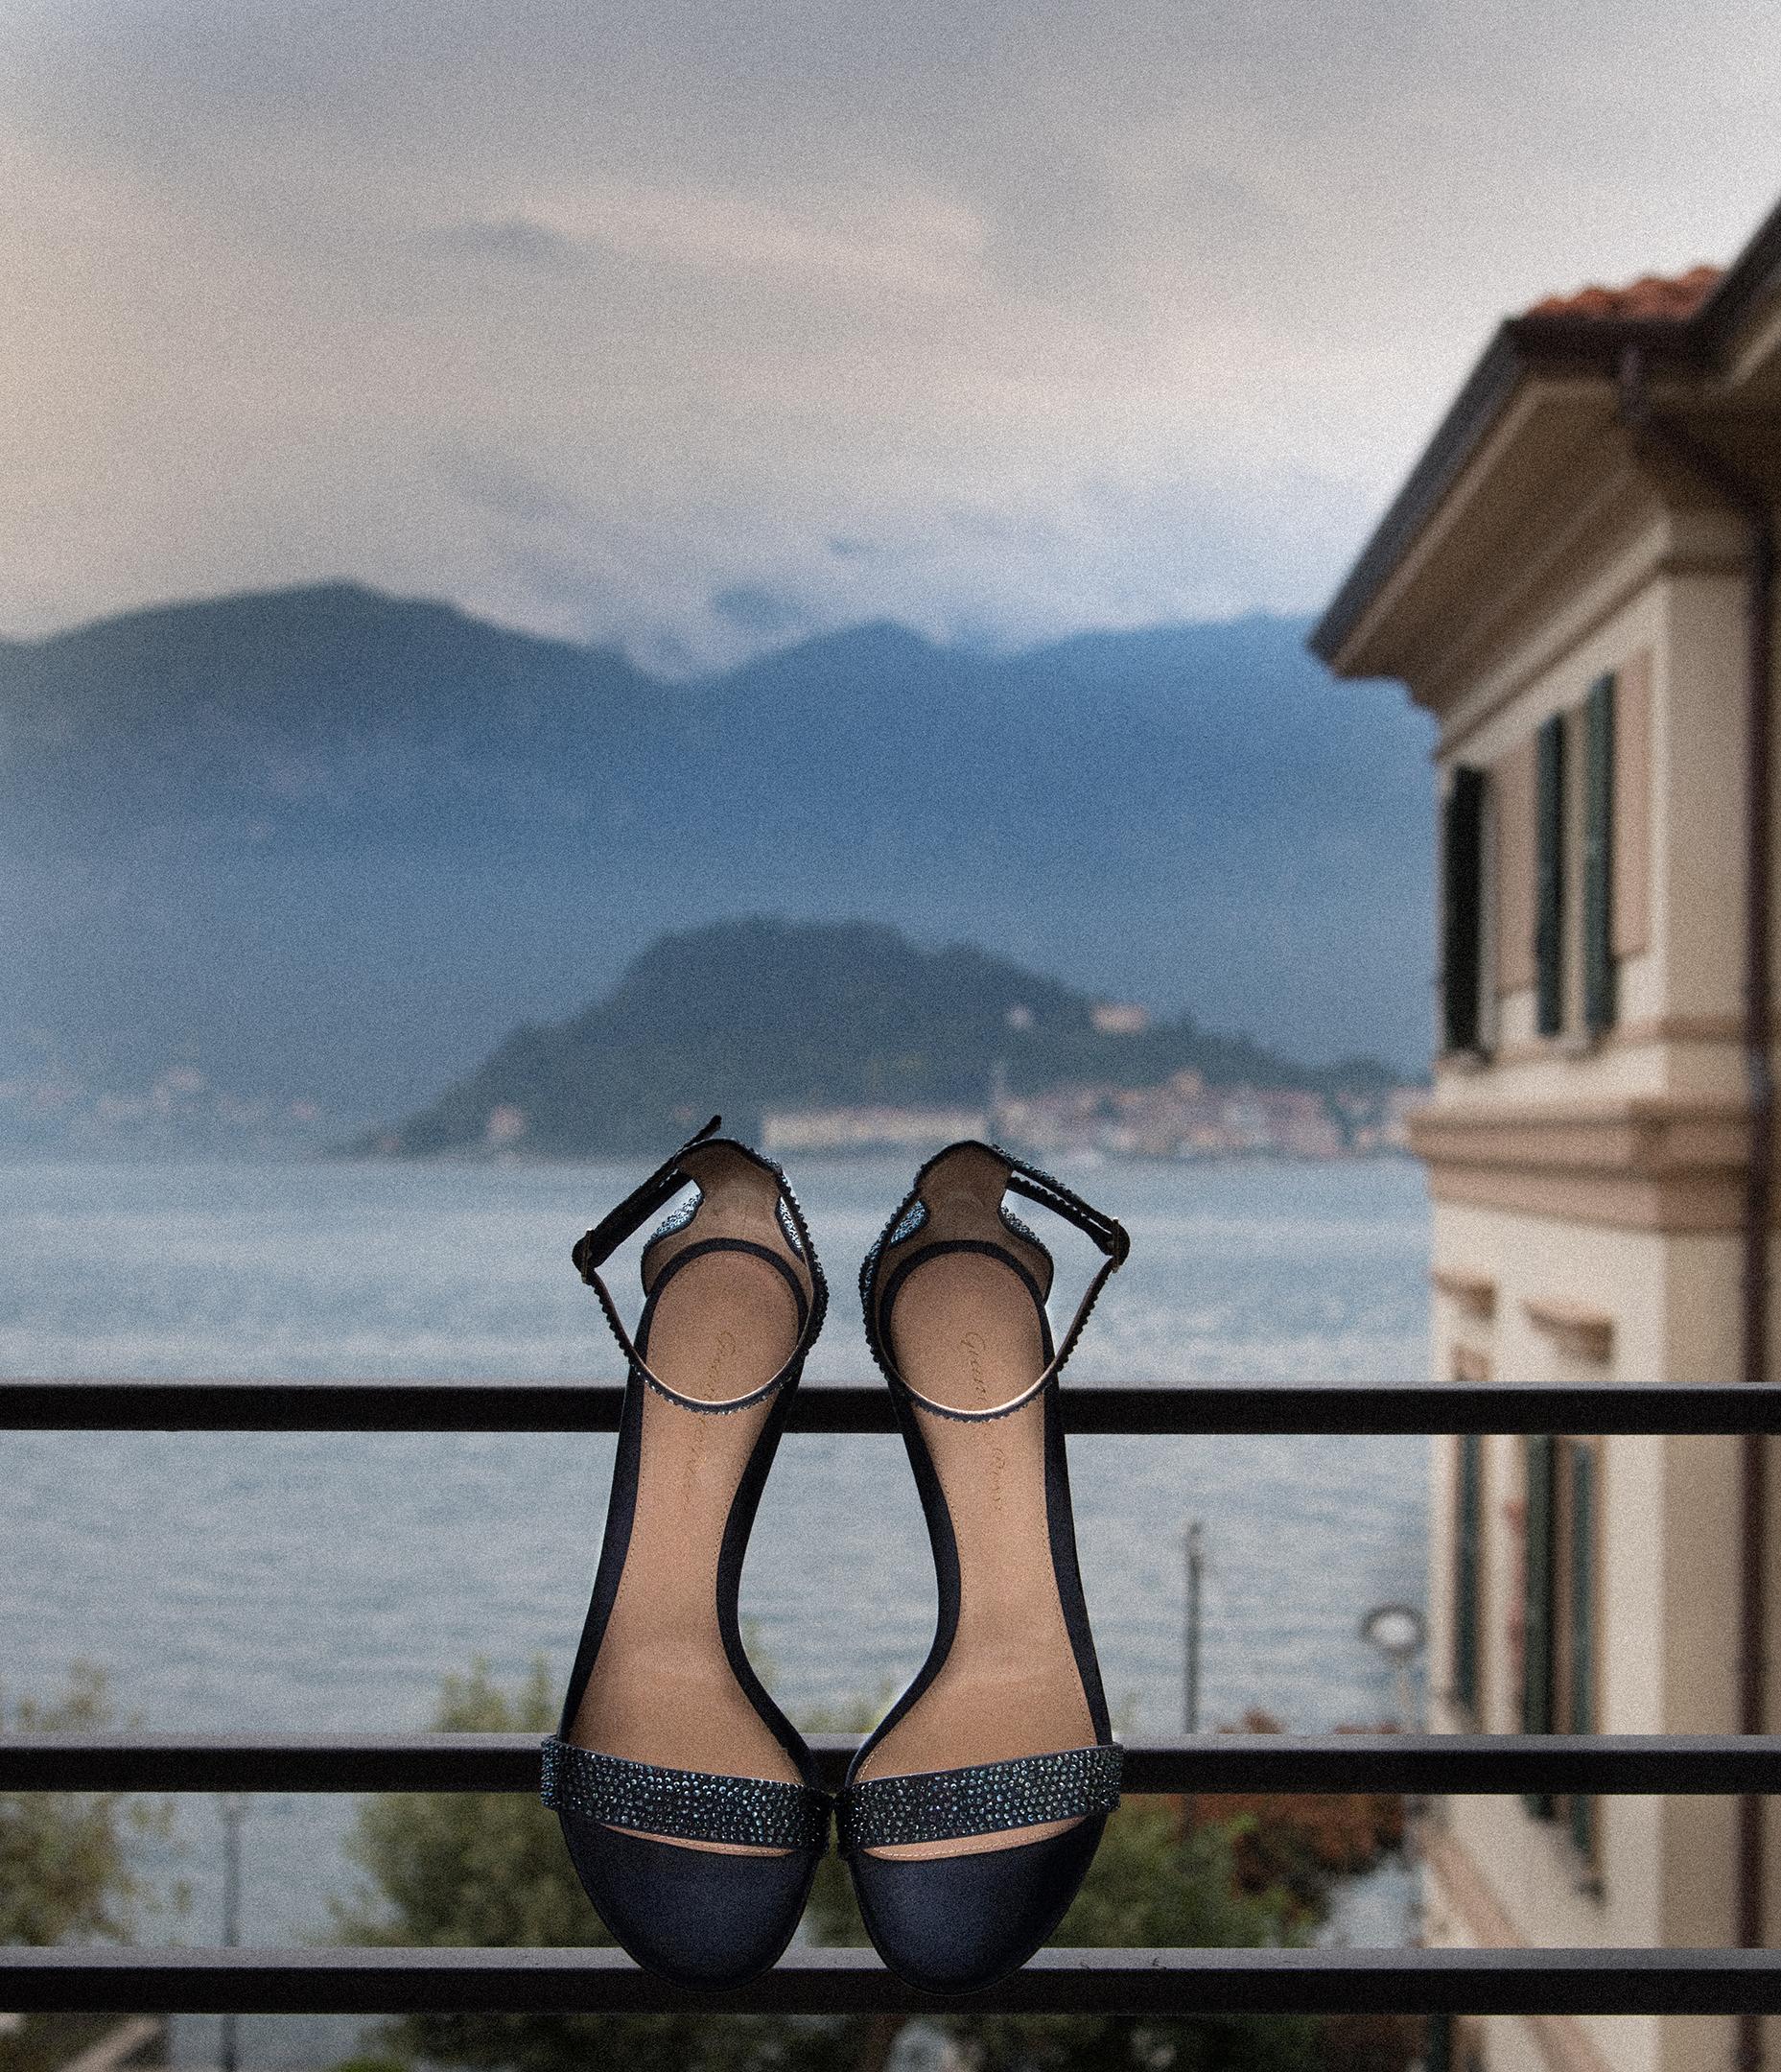 lake-como-jamie-levine-photography-shoes.jpg